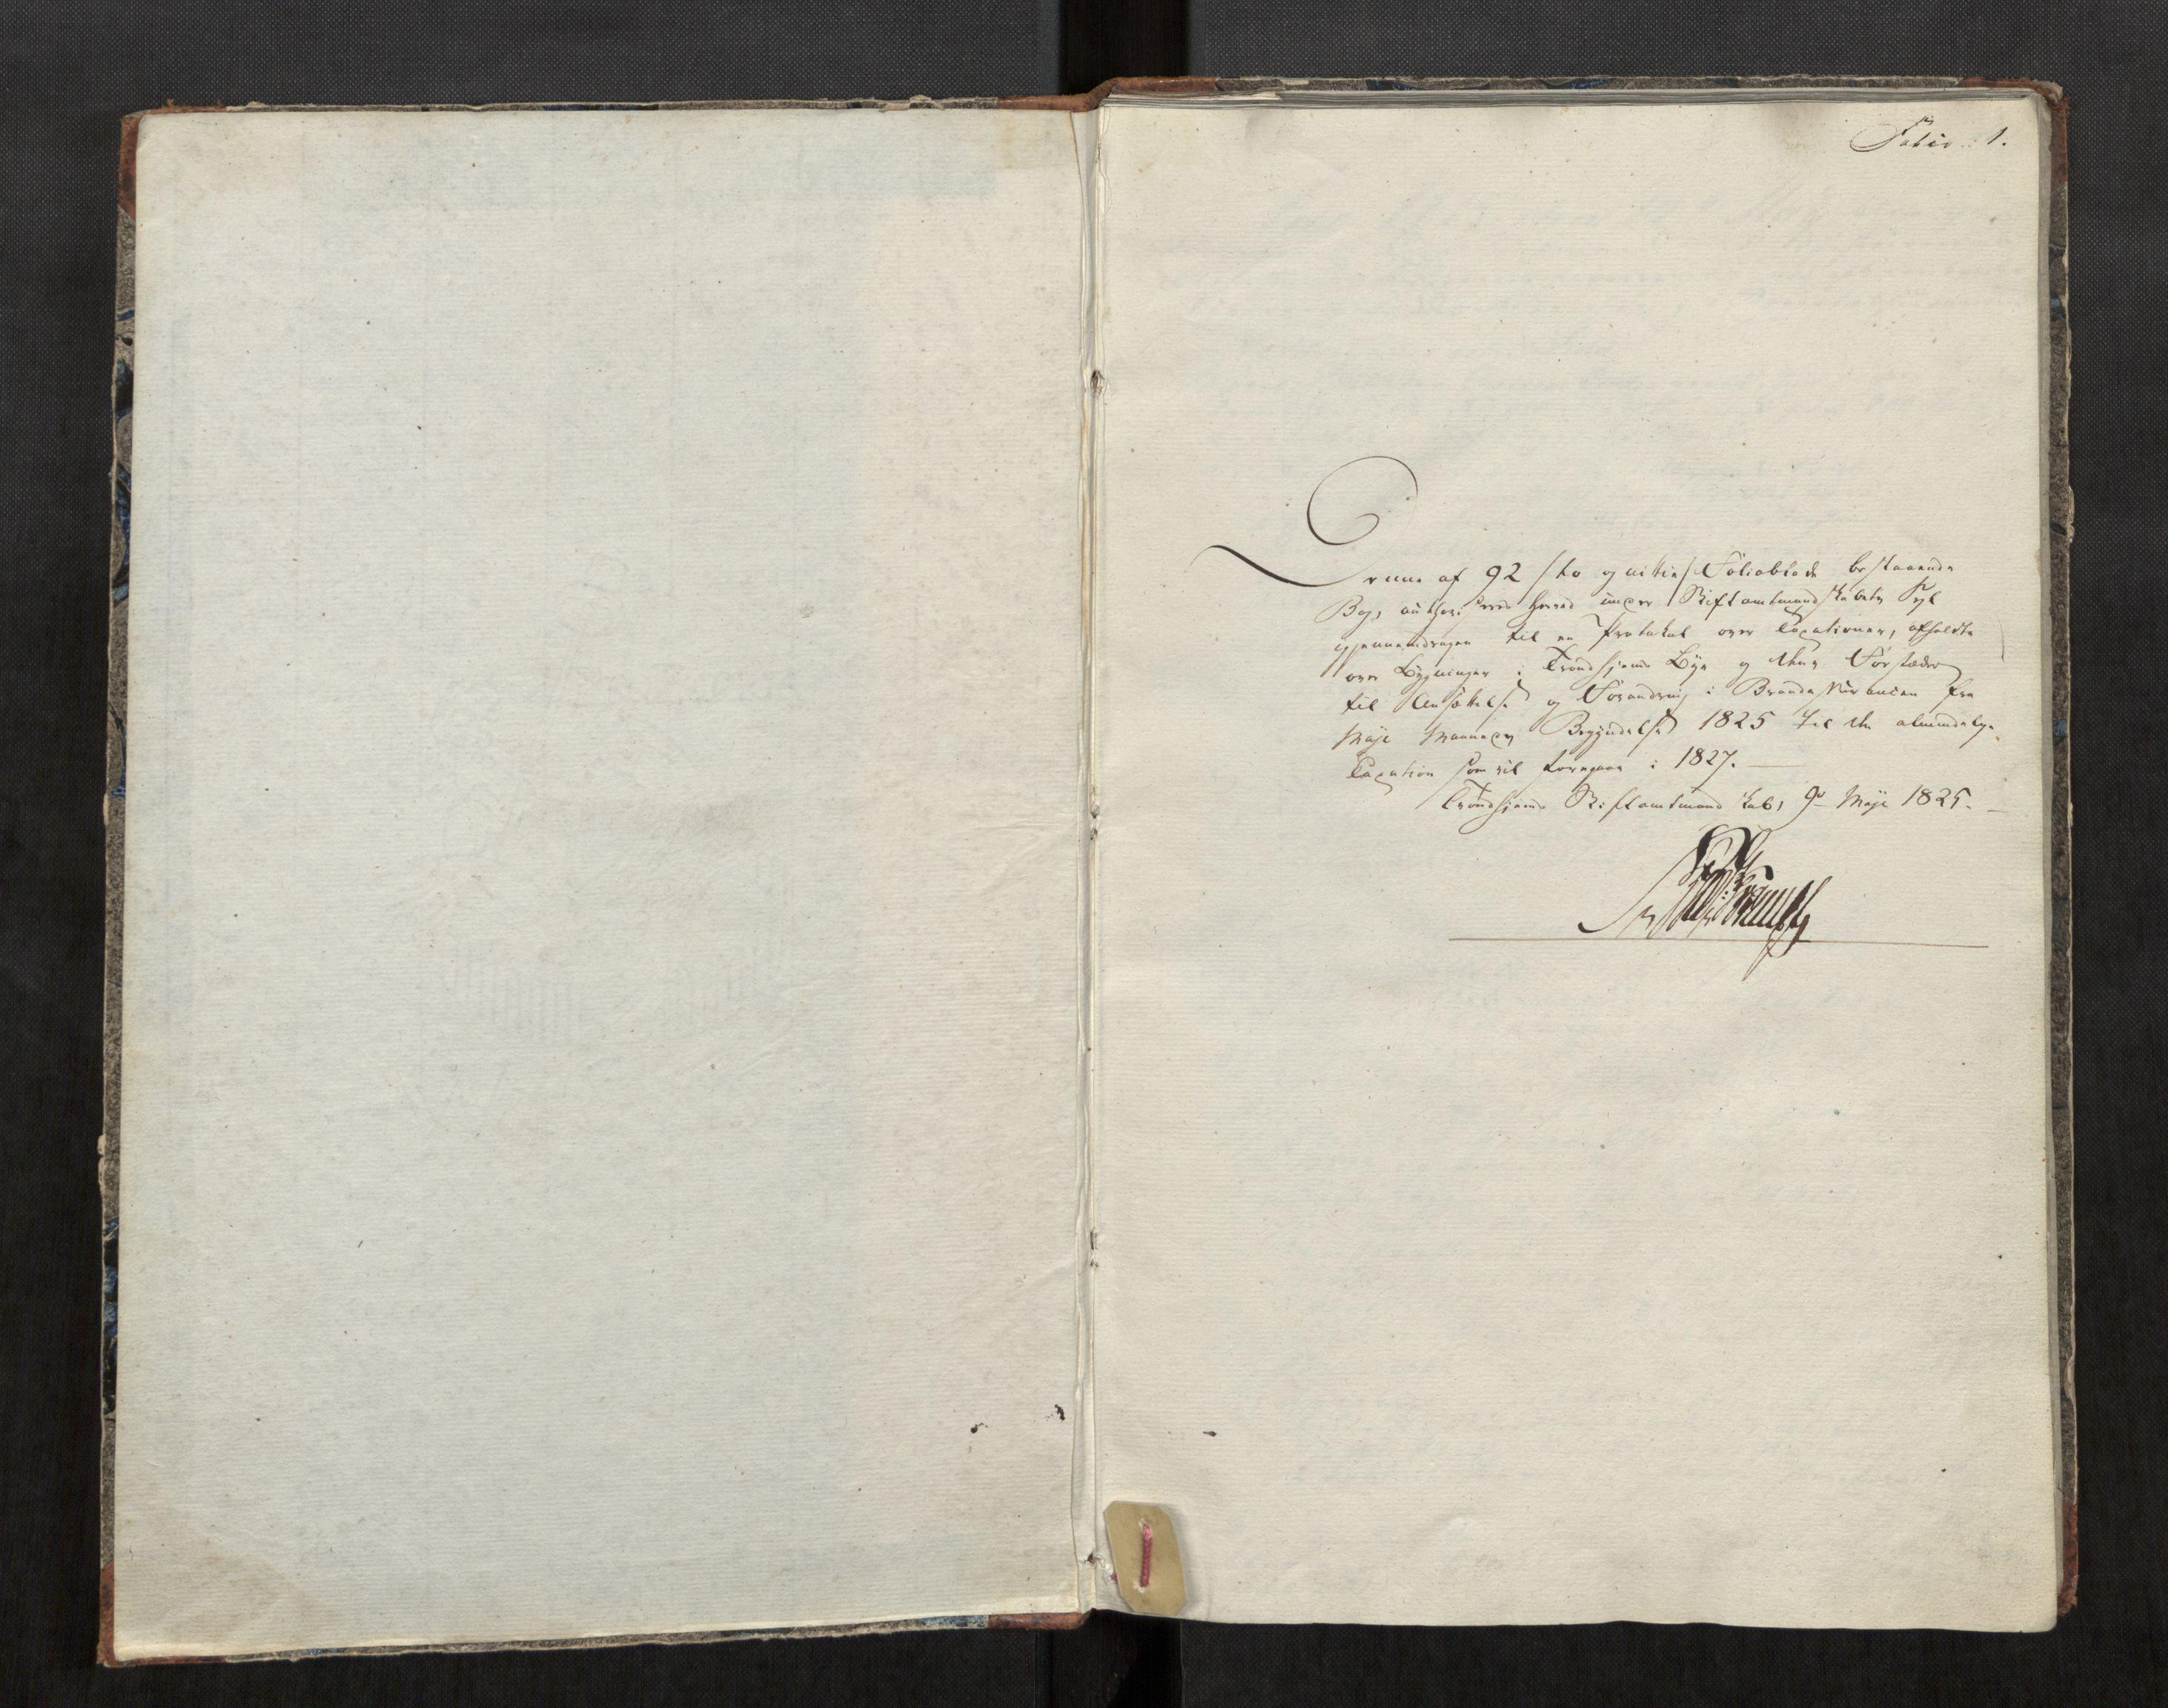 SAT, Norges Brannkasse Trondheim magistrat, Fa/L0011: Branntakstprotokoll K13, 1825-1827